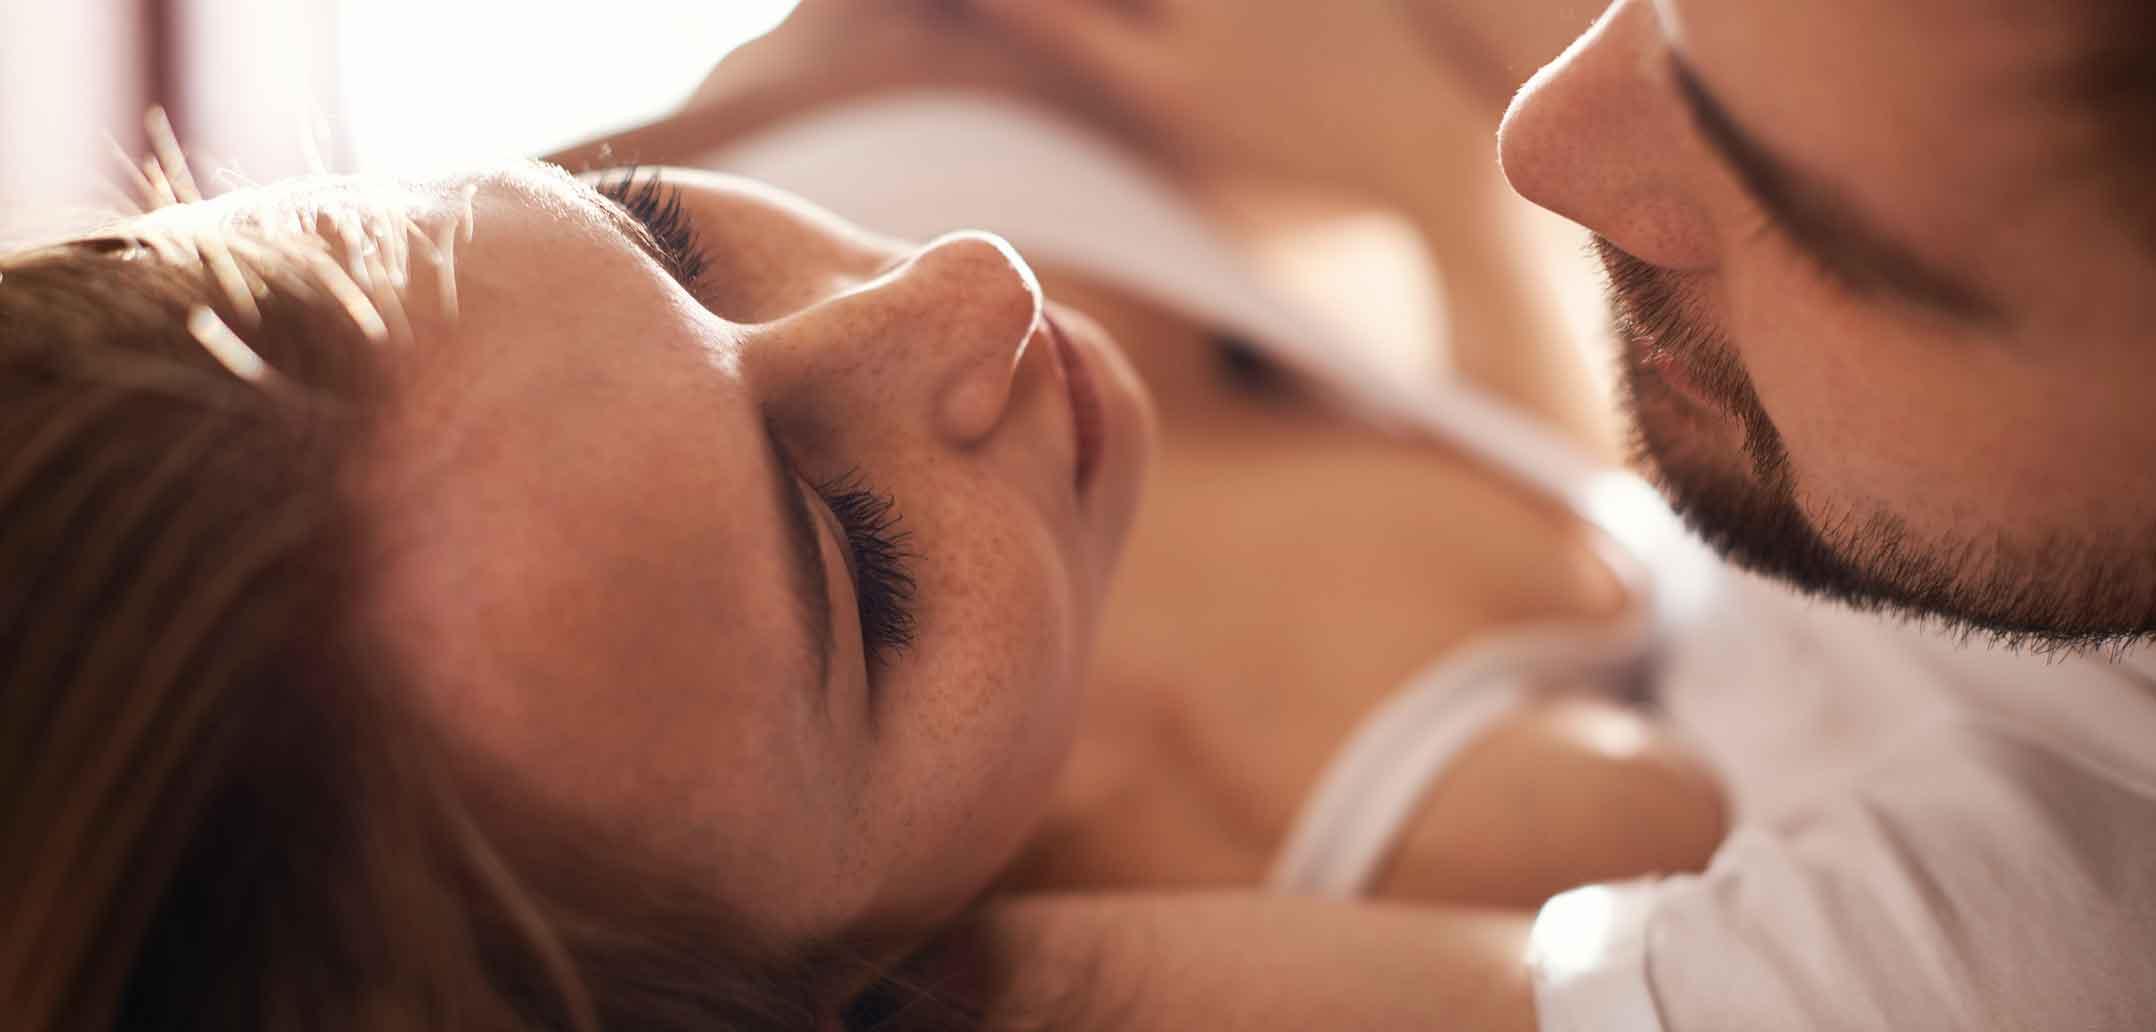 Auch im Bett gilt: Der Partner kann nicht hellsehen